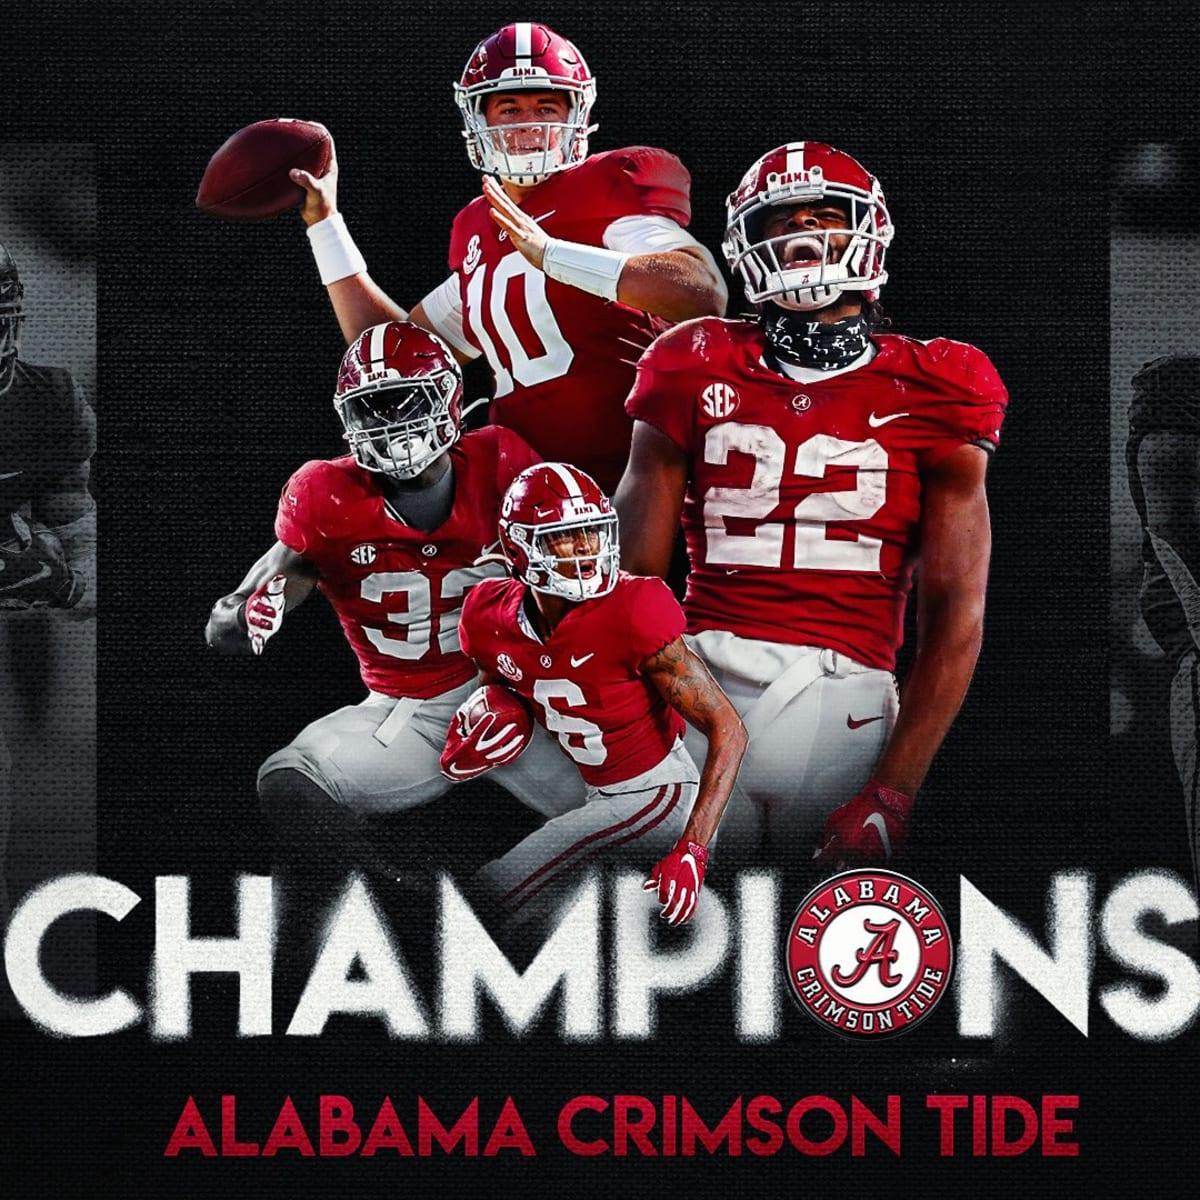 Alabama Football Crimson Tide Roll Call Dec 20 2020 Sec Championship Sports Illustrated Alabama Crimson Tide News Analysis And More